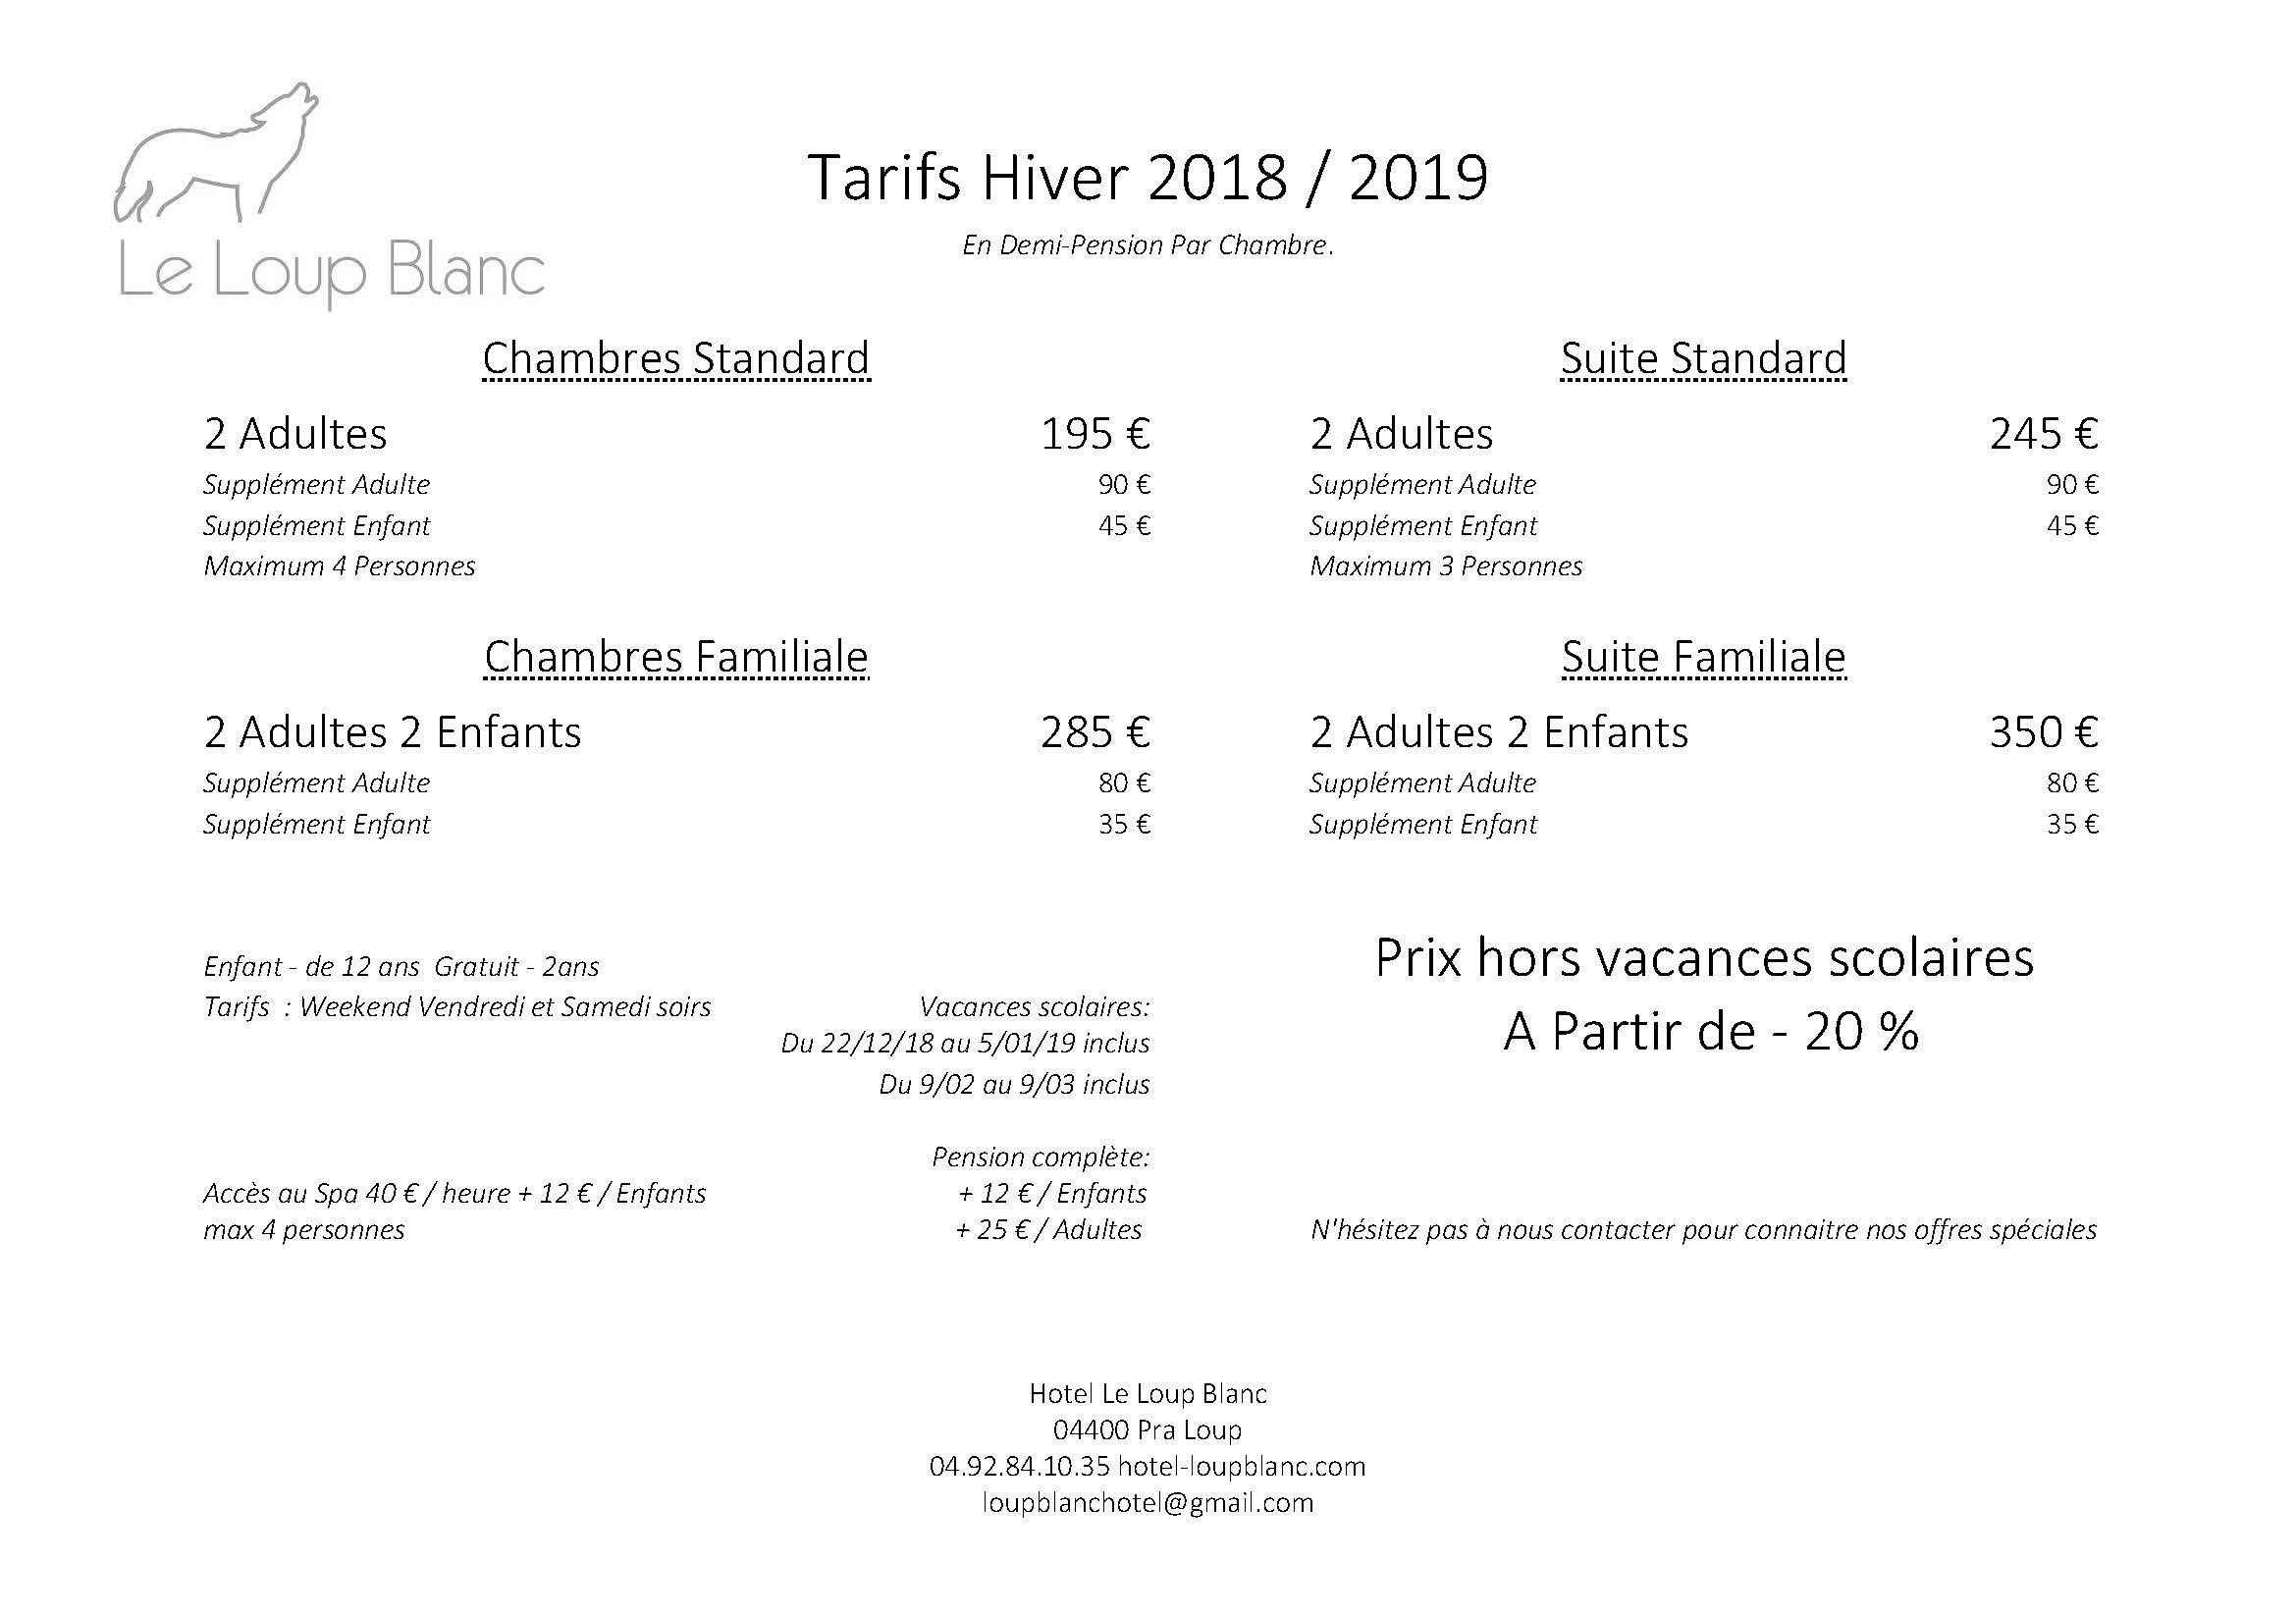 Tarifs Hiver 2018.19